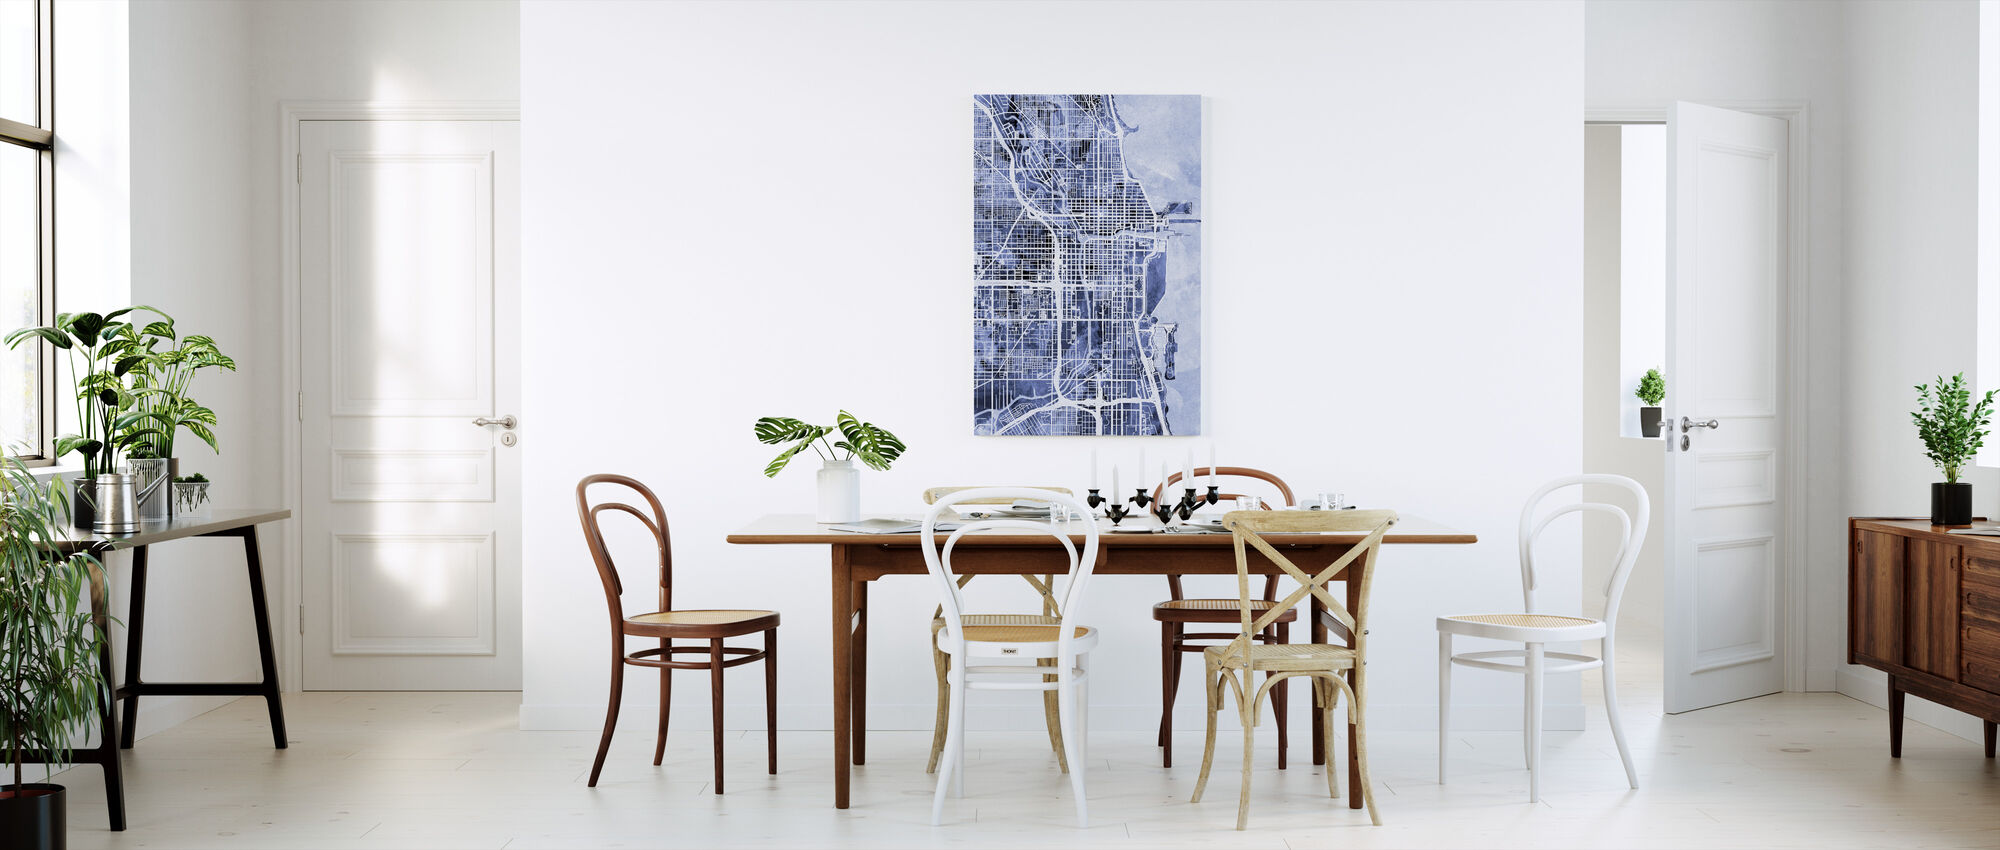 Chicago City Street Map - Canvas print - Kitchen